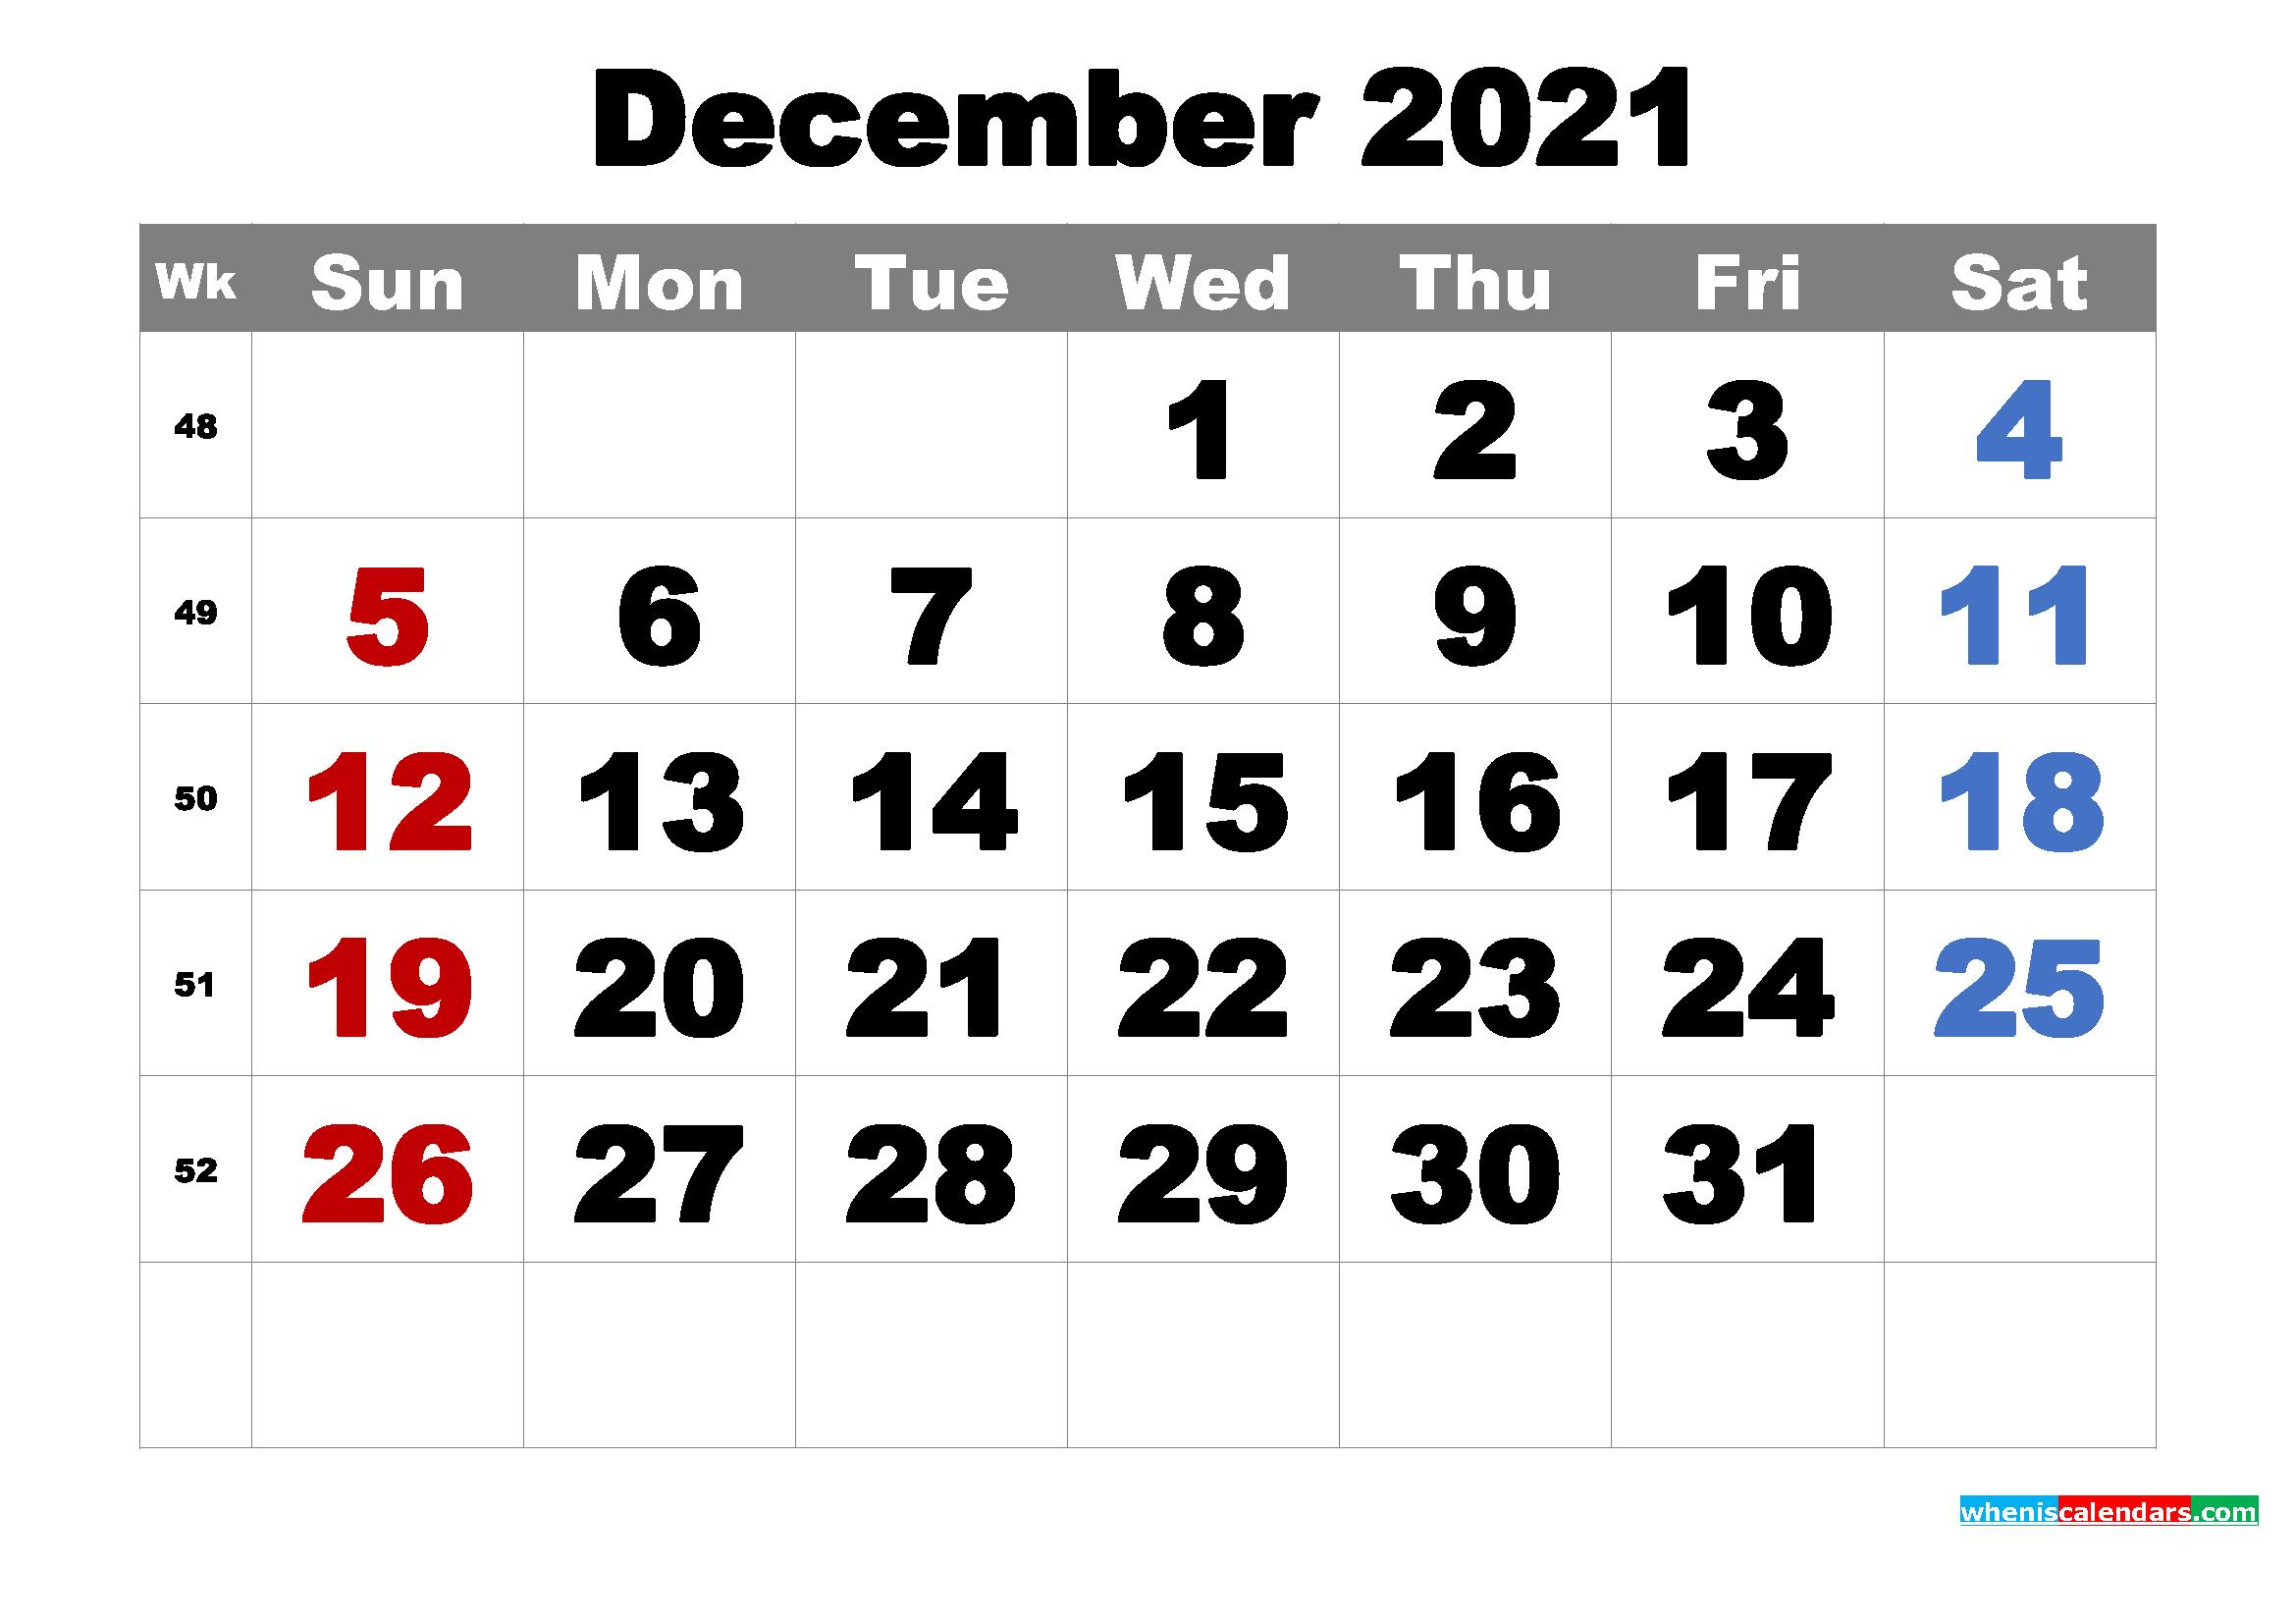 Free Printable December 2021 Calendar Word, Pdf, Image pertaining to 2021 Writable Calendars By Month